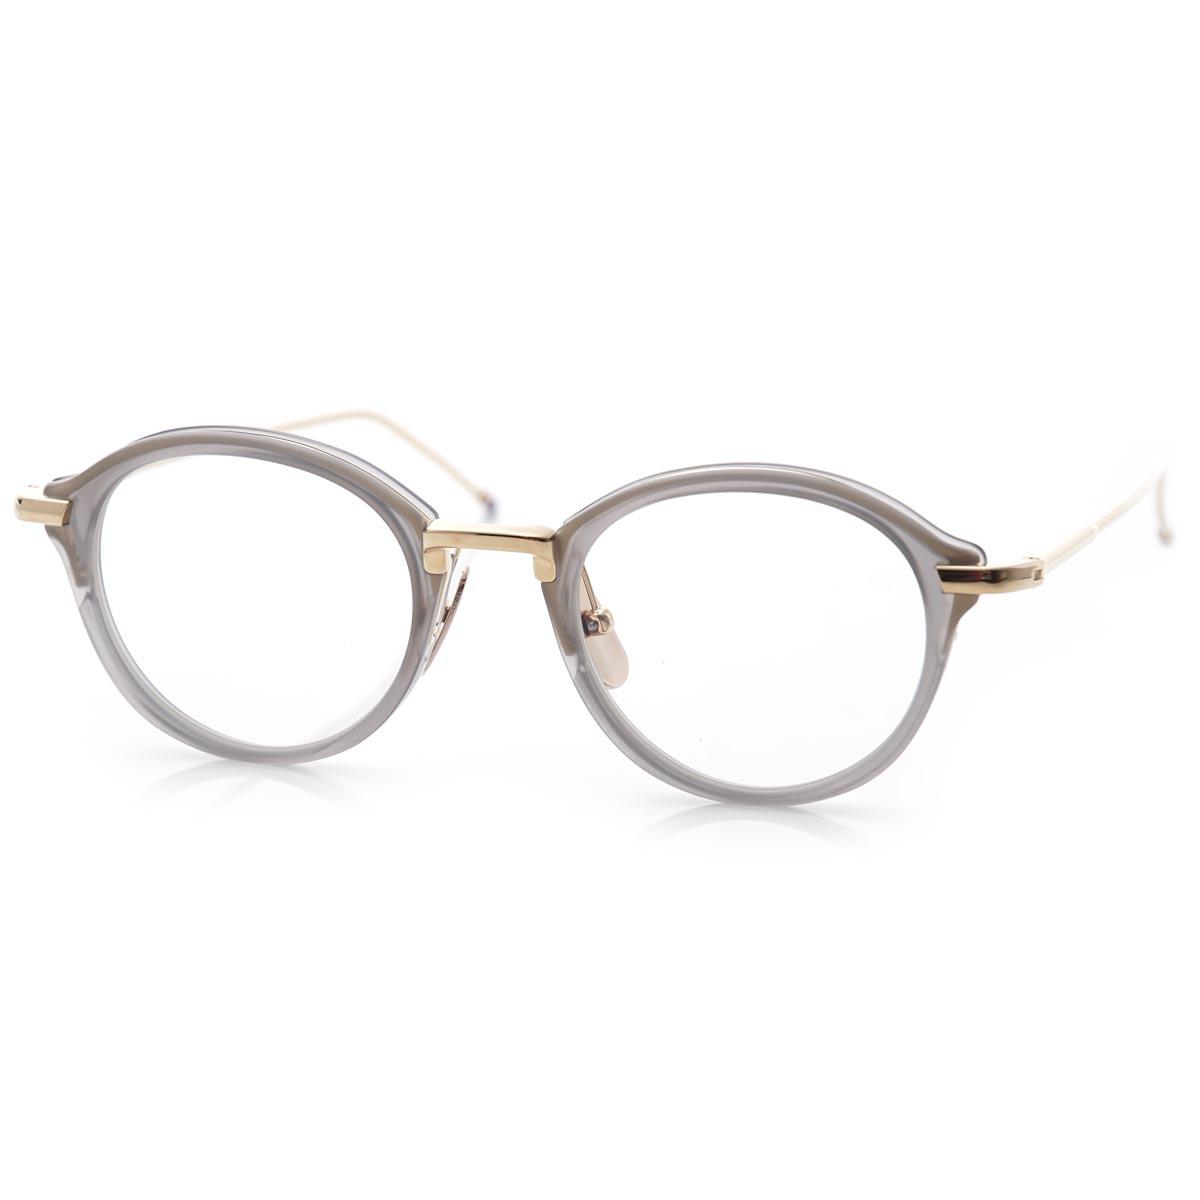 c4b94e0def89 Tom Browne THOM BROWNE. Glasses glasses Oval GREYGOLD gray system tb 011 g  gry gld men